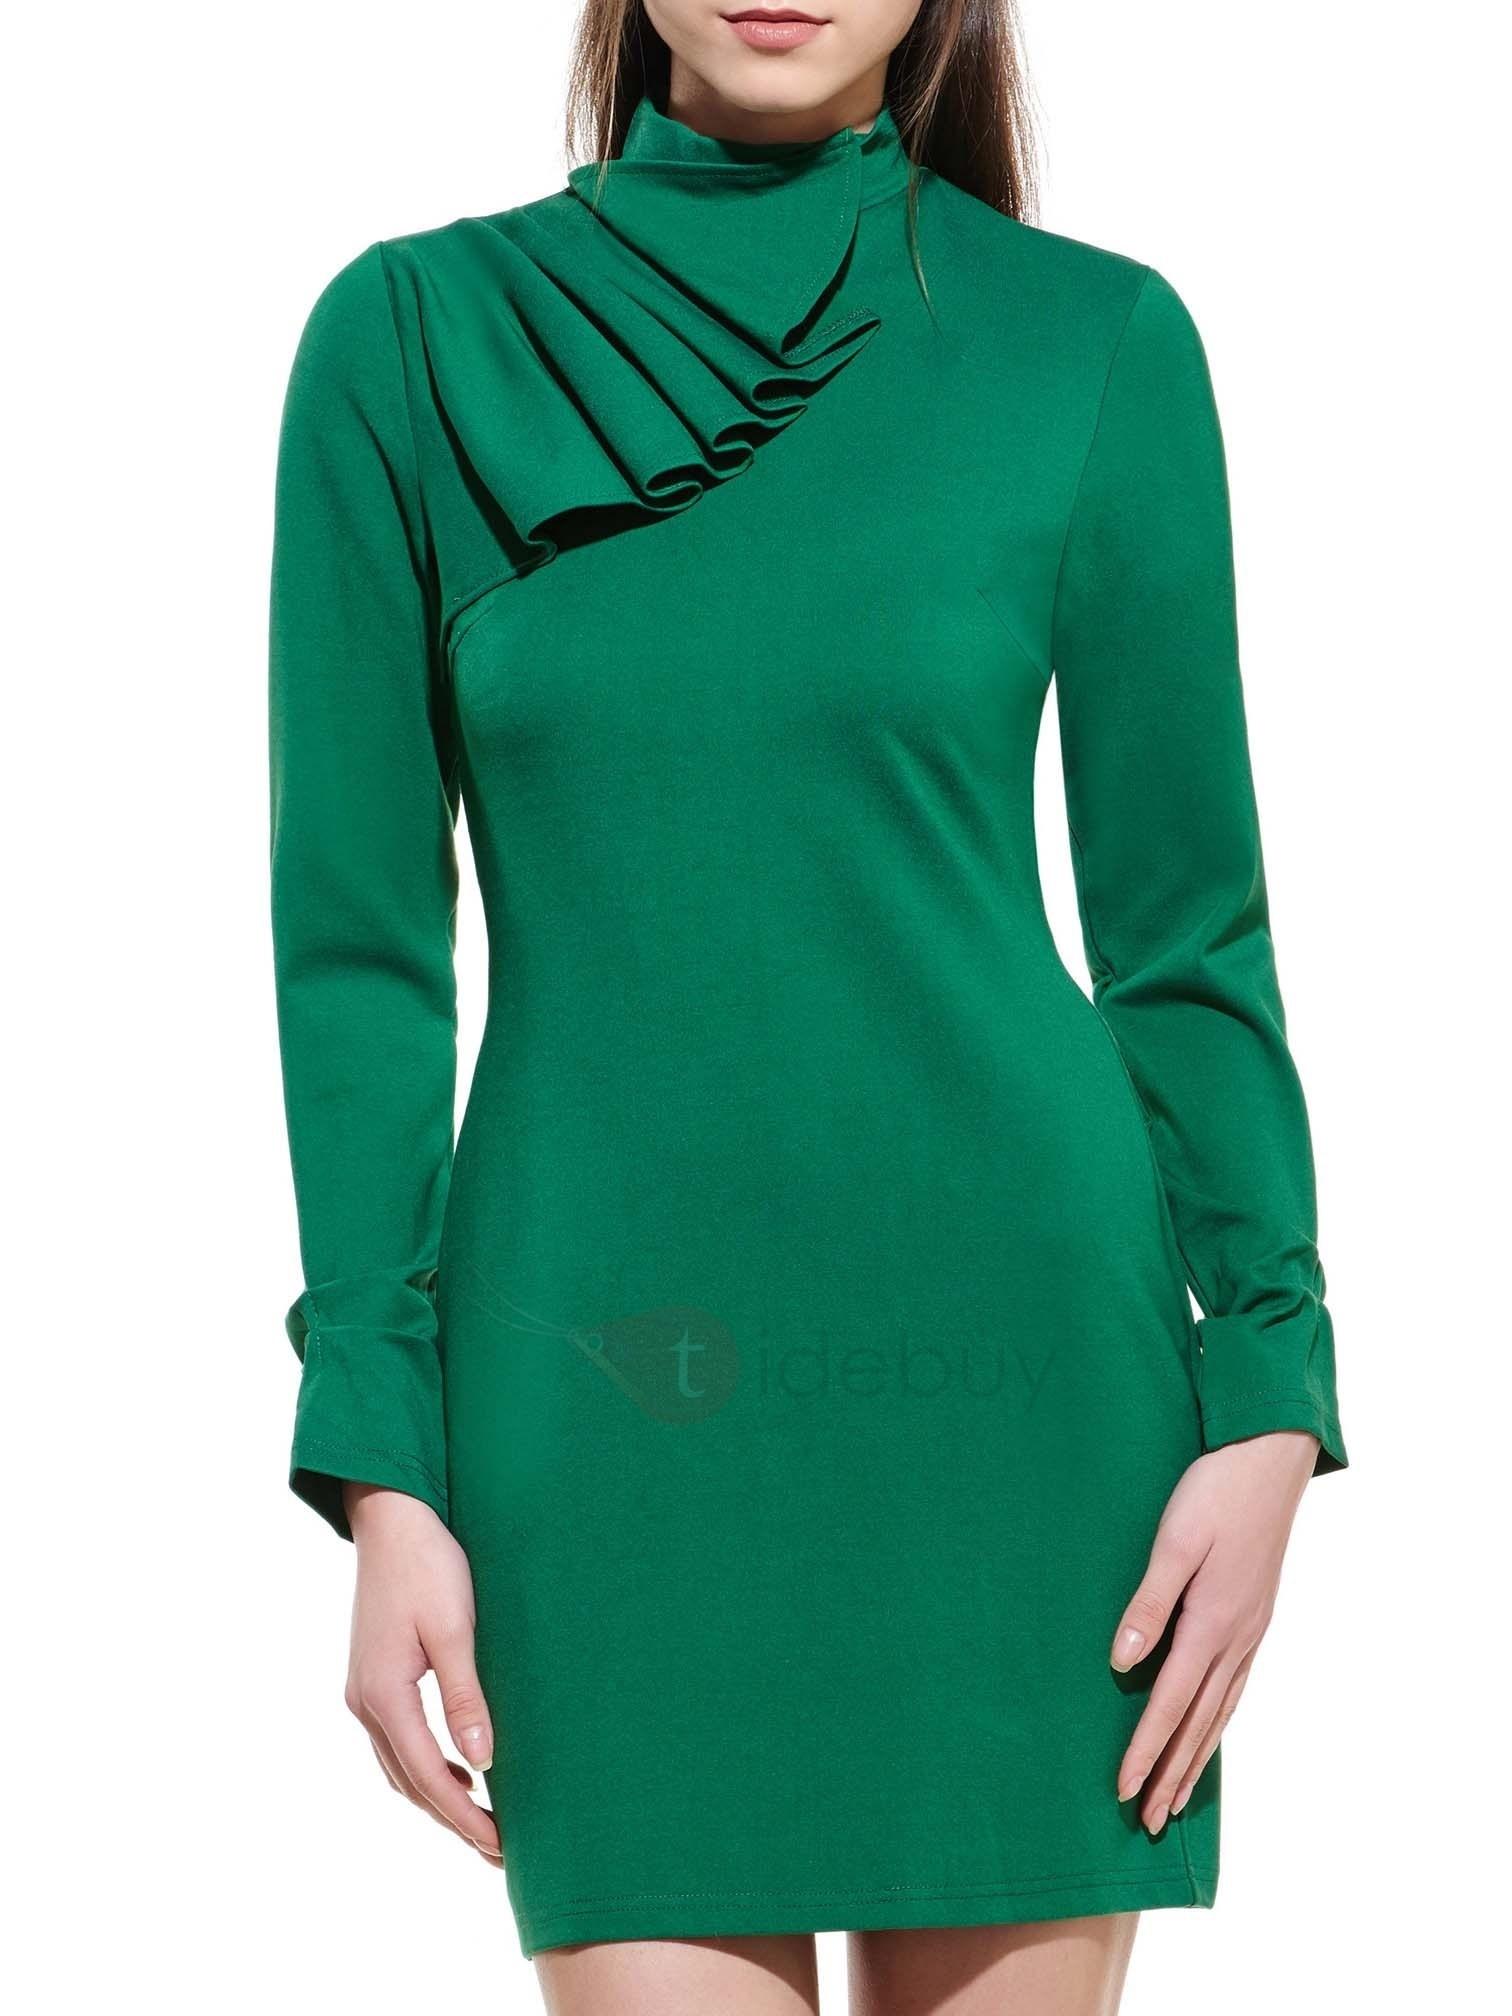 15 Genial Kleid Dunkelgrün Langarm für 2019Designer Wunderbar Kleid Dunkelgrün Langarm für 2019